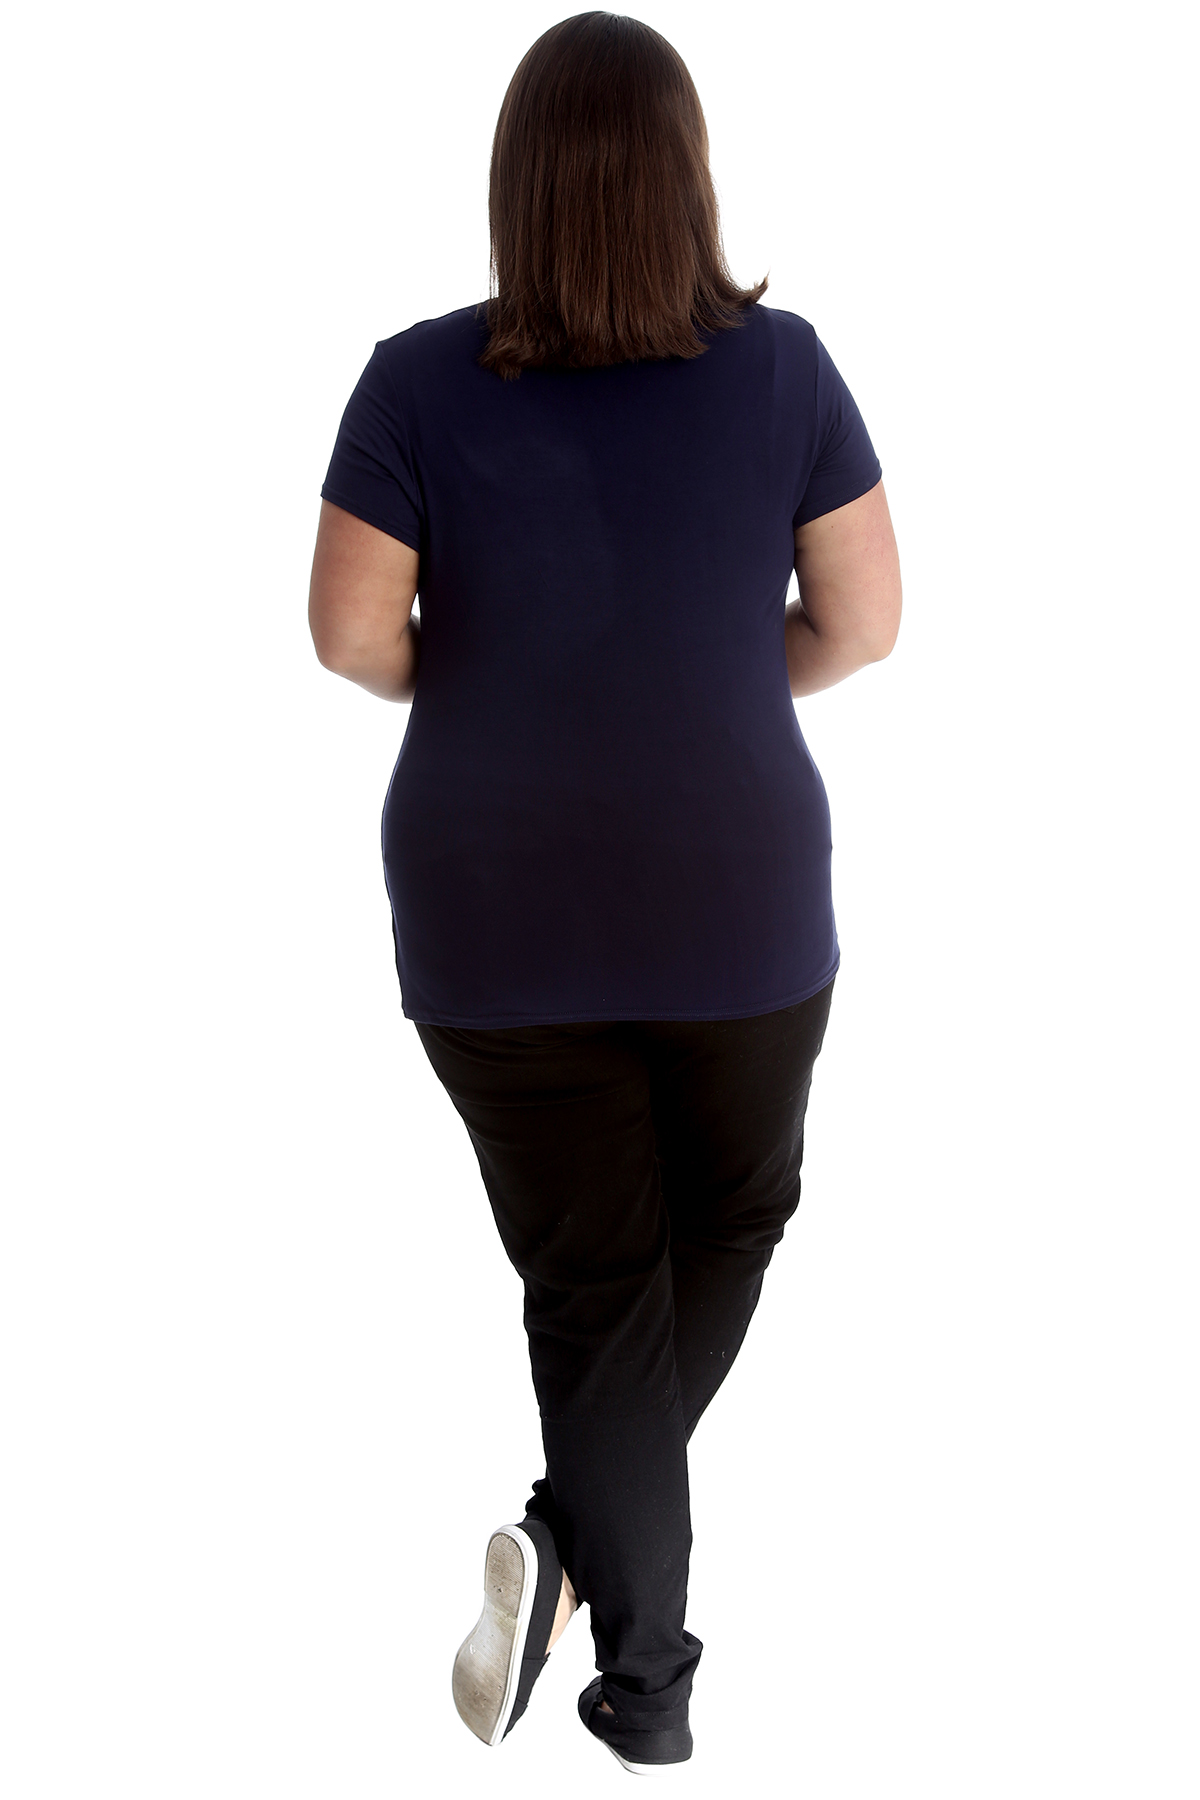 New-Womens-Plus-Size-Top-Ladies-Cherry-Rhinestone-T-Shirt-Soft-Stud-Shiny-Hip thumbnail 34